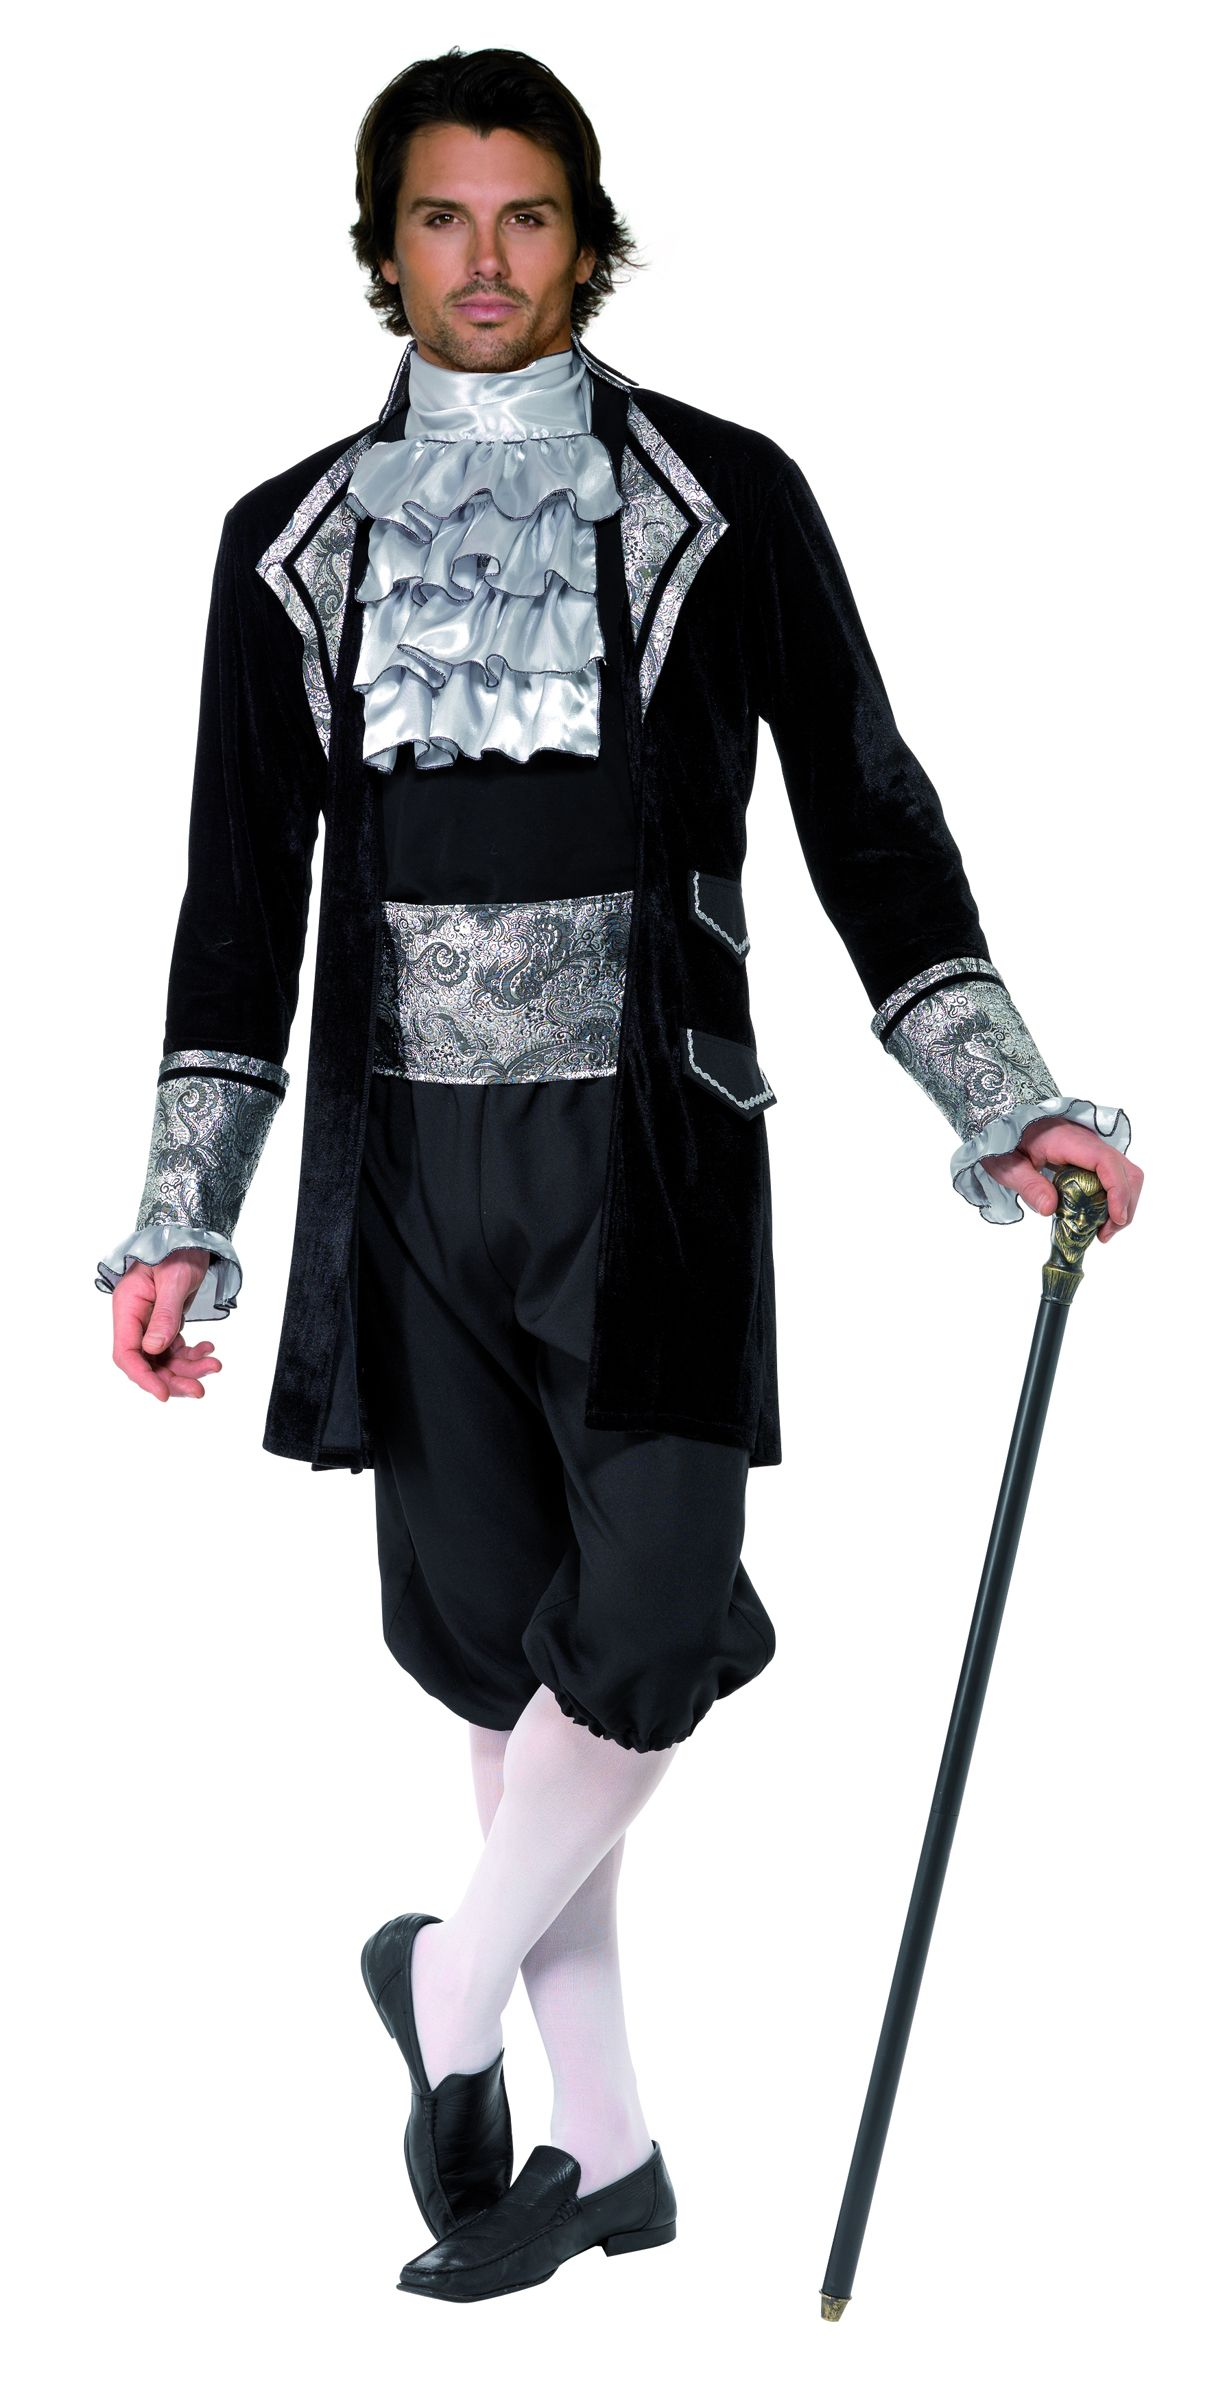 disfraz de vampiro para hombre ideal para halloween traje de lujo de vampiro para